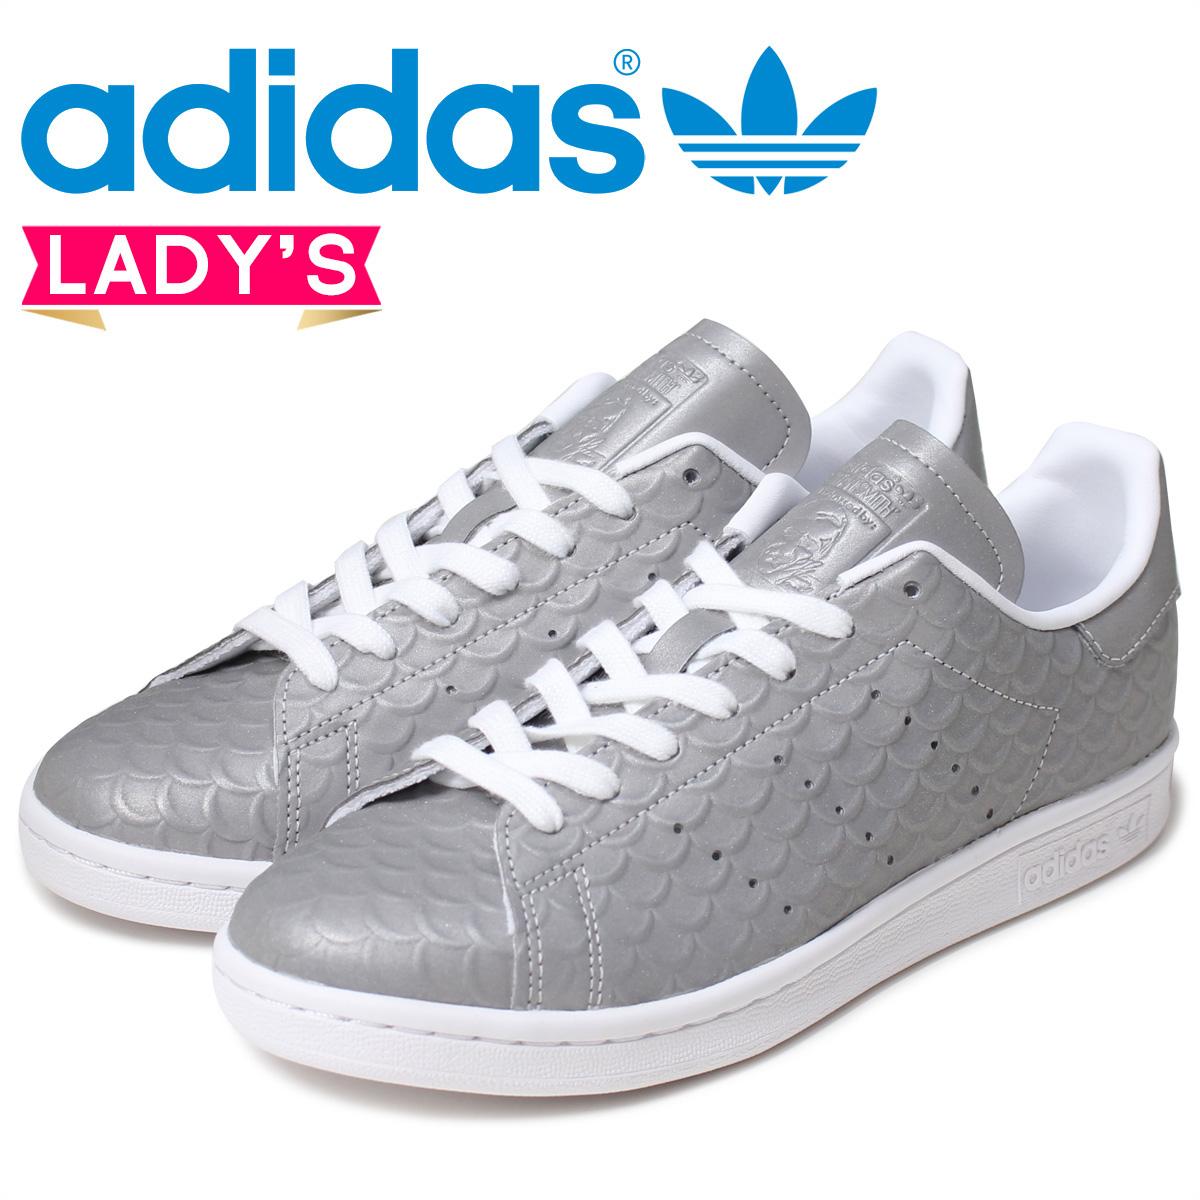 adidas stan smith your face